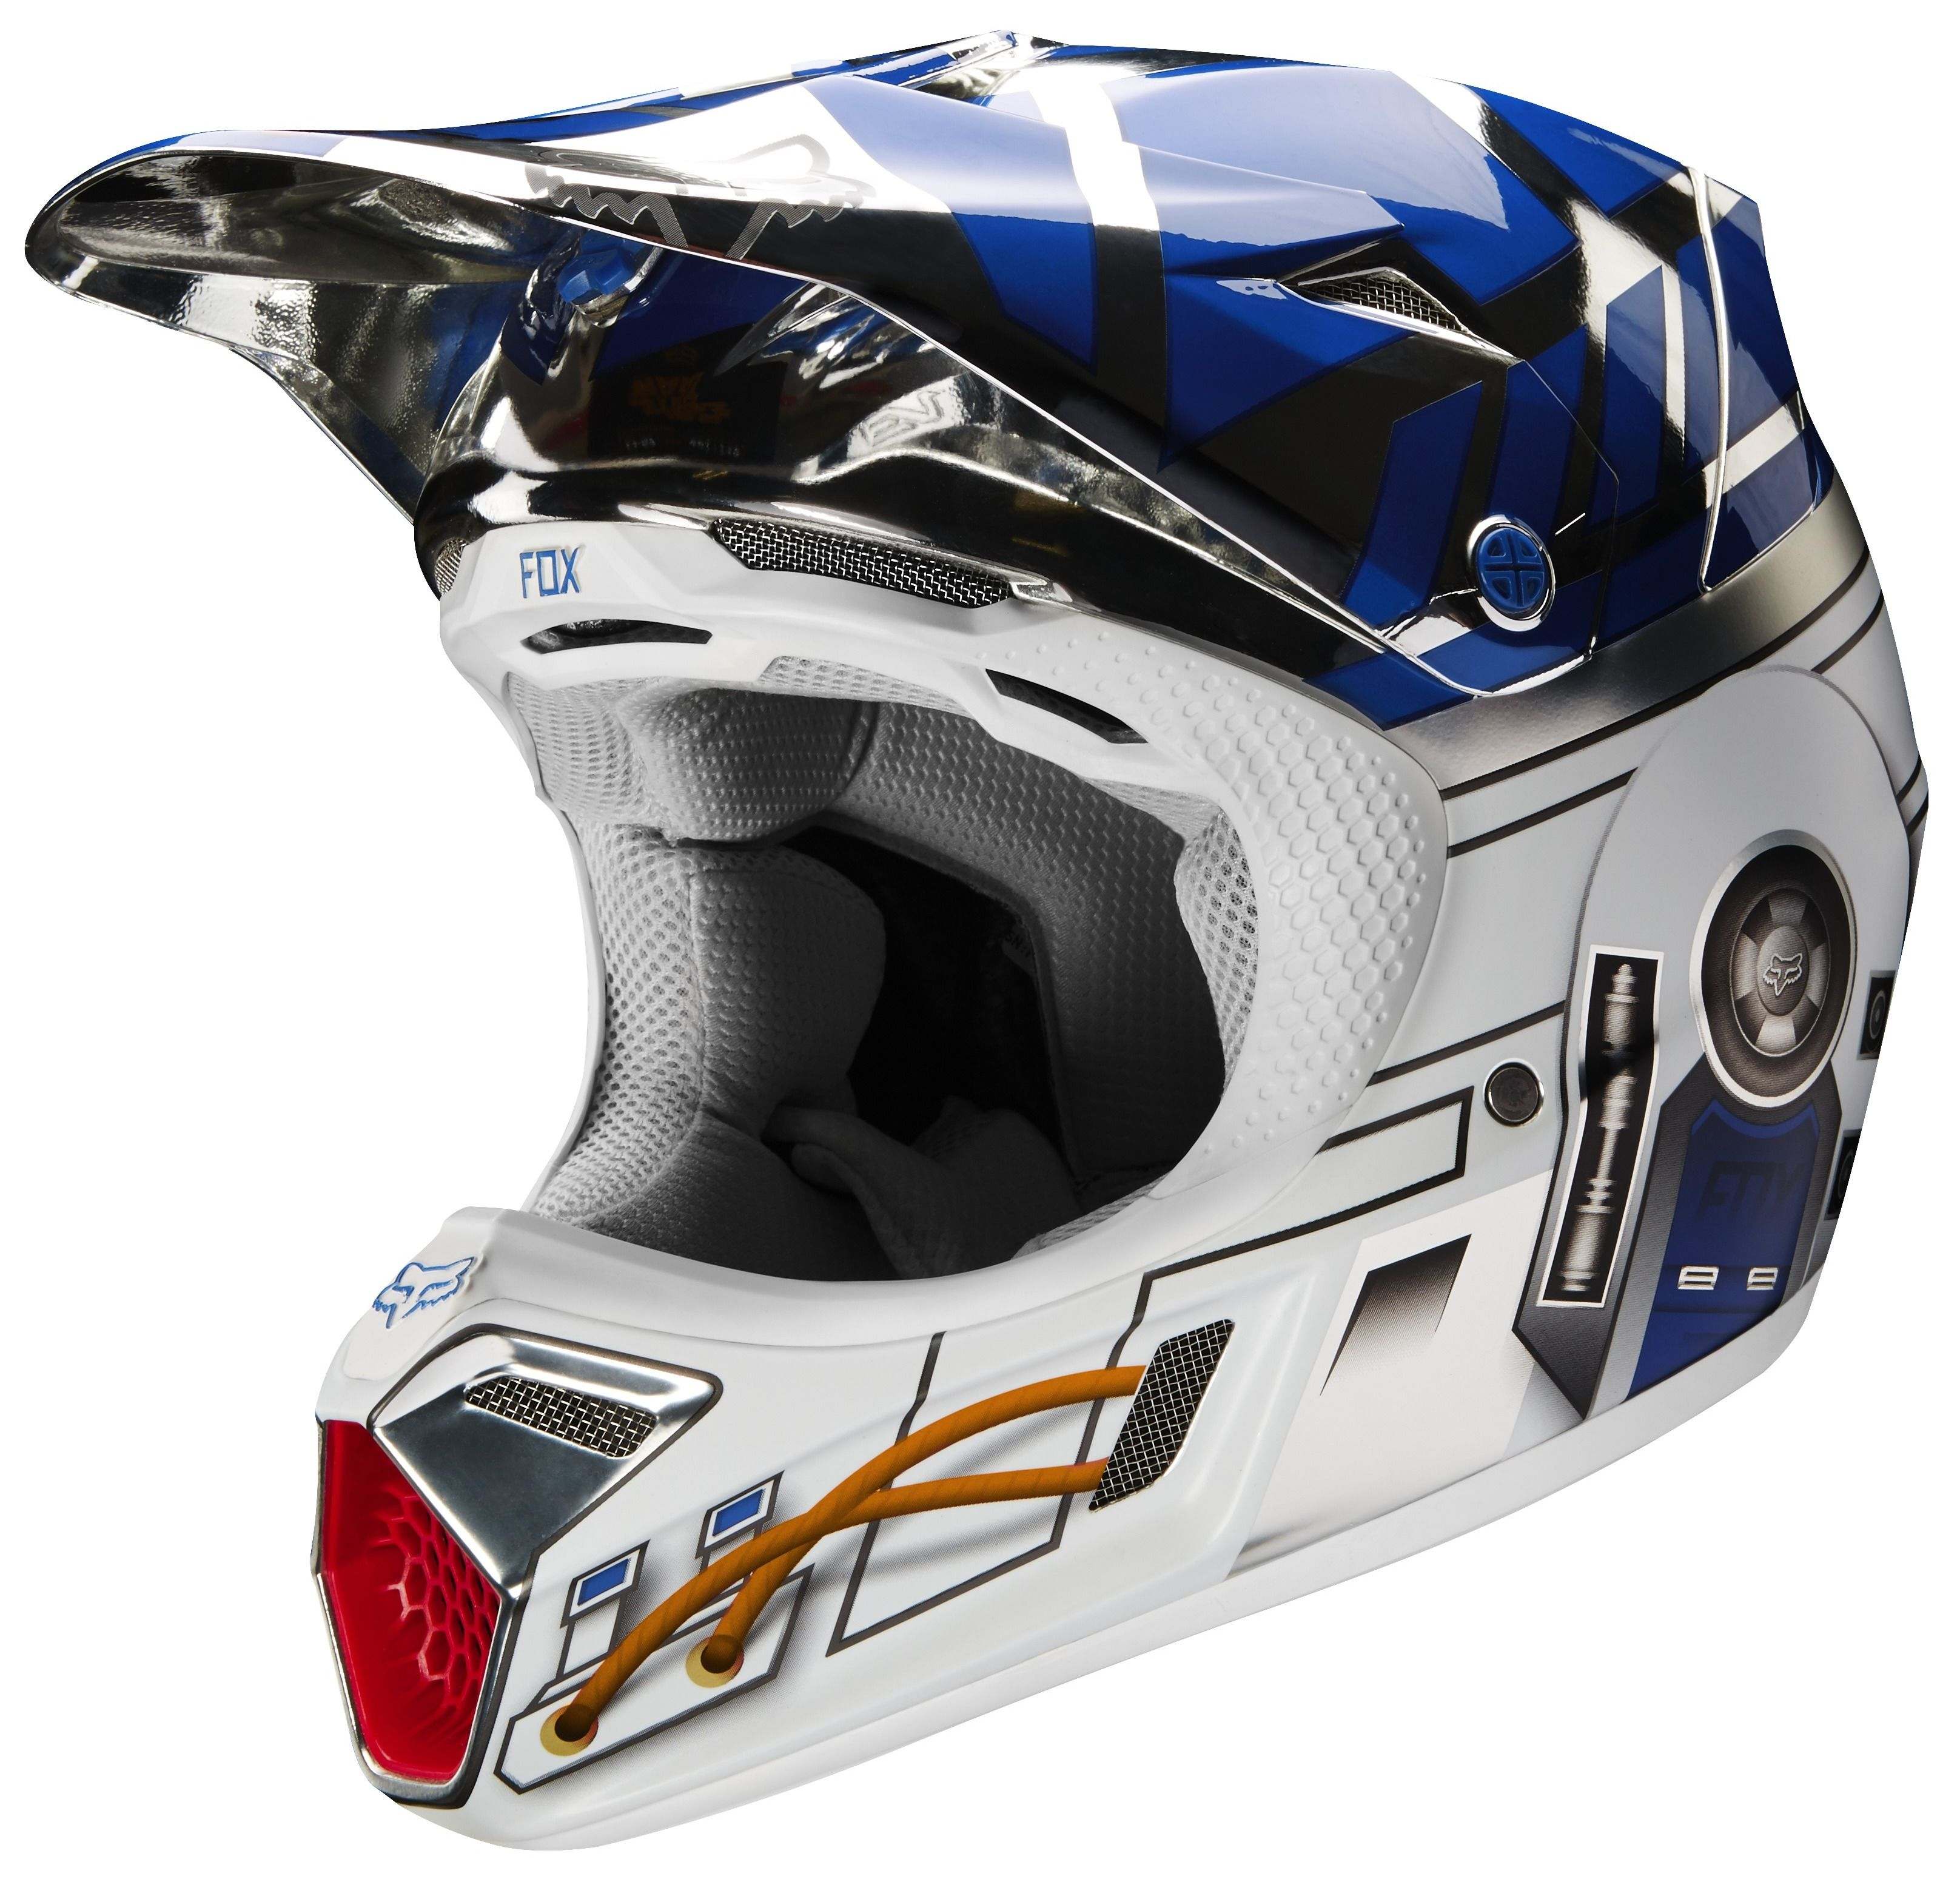 fox racing v3 r2d2 le helmet cycle gear. Black Bedroom Furniture Sets. Home Design Ideas